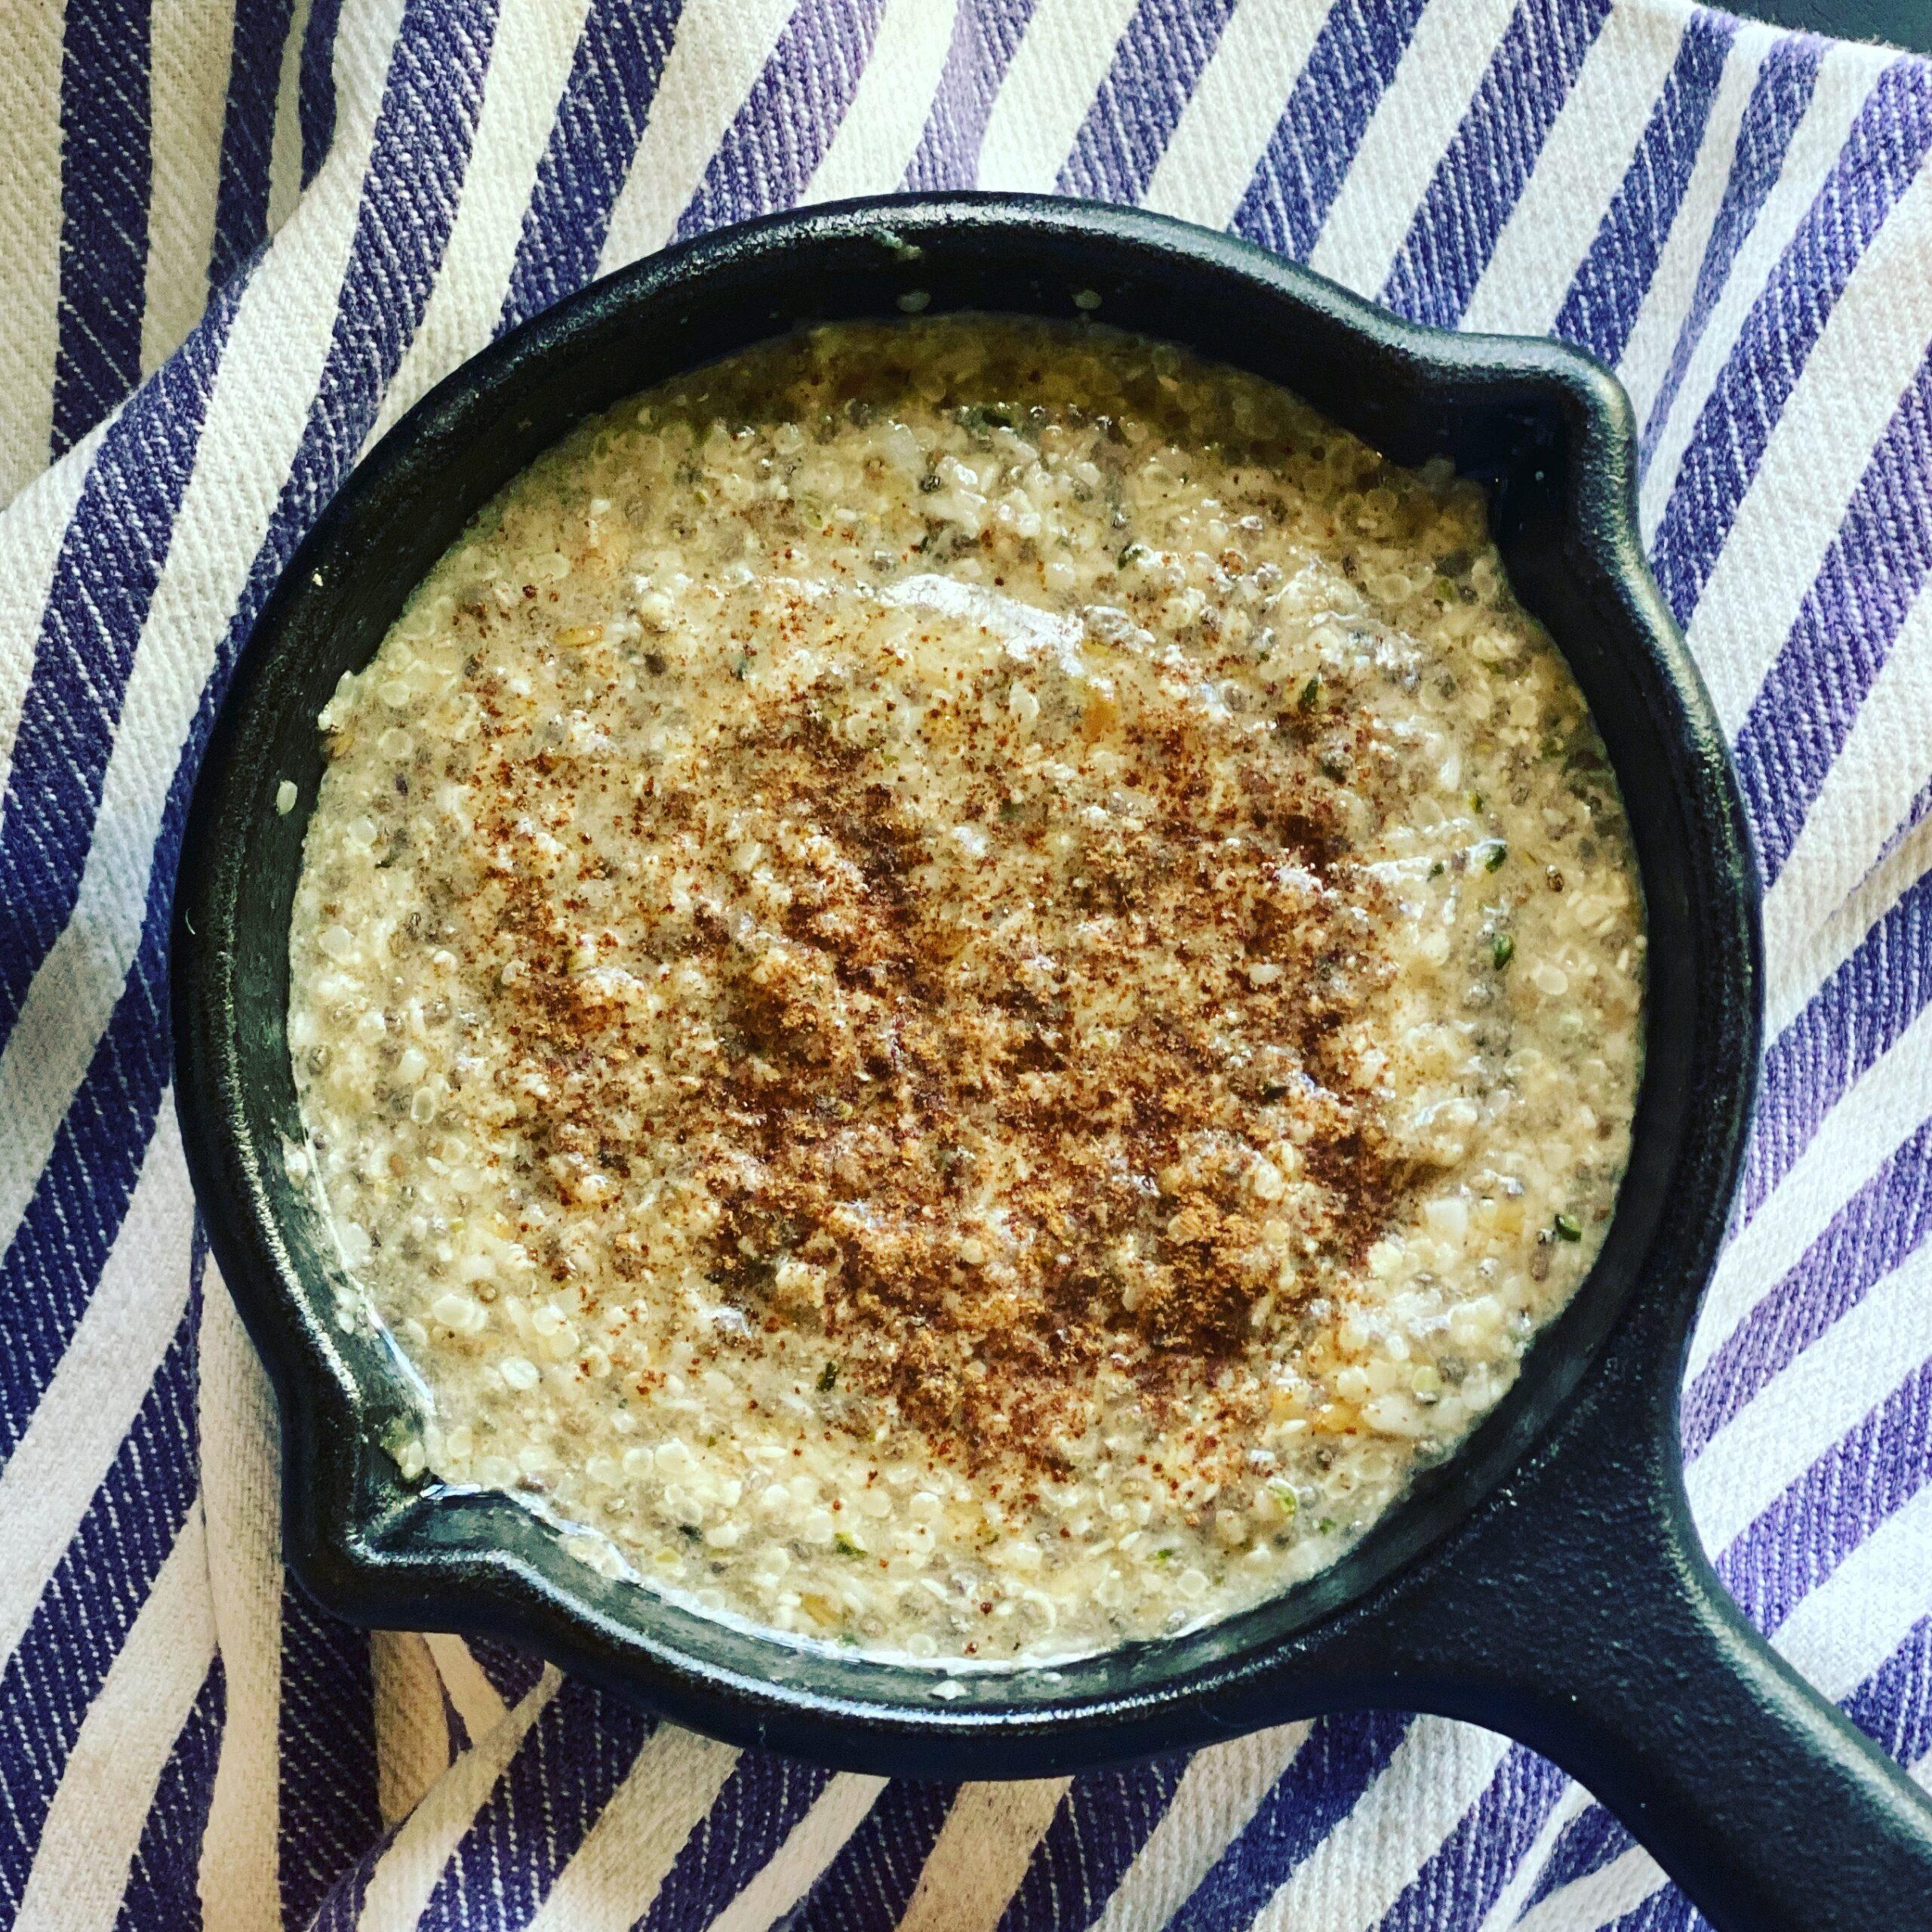 Chai Spice Hempseed Porridge (Nootropic, Keto, Vegan)